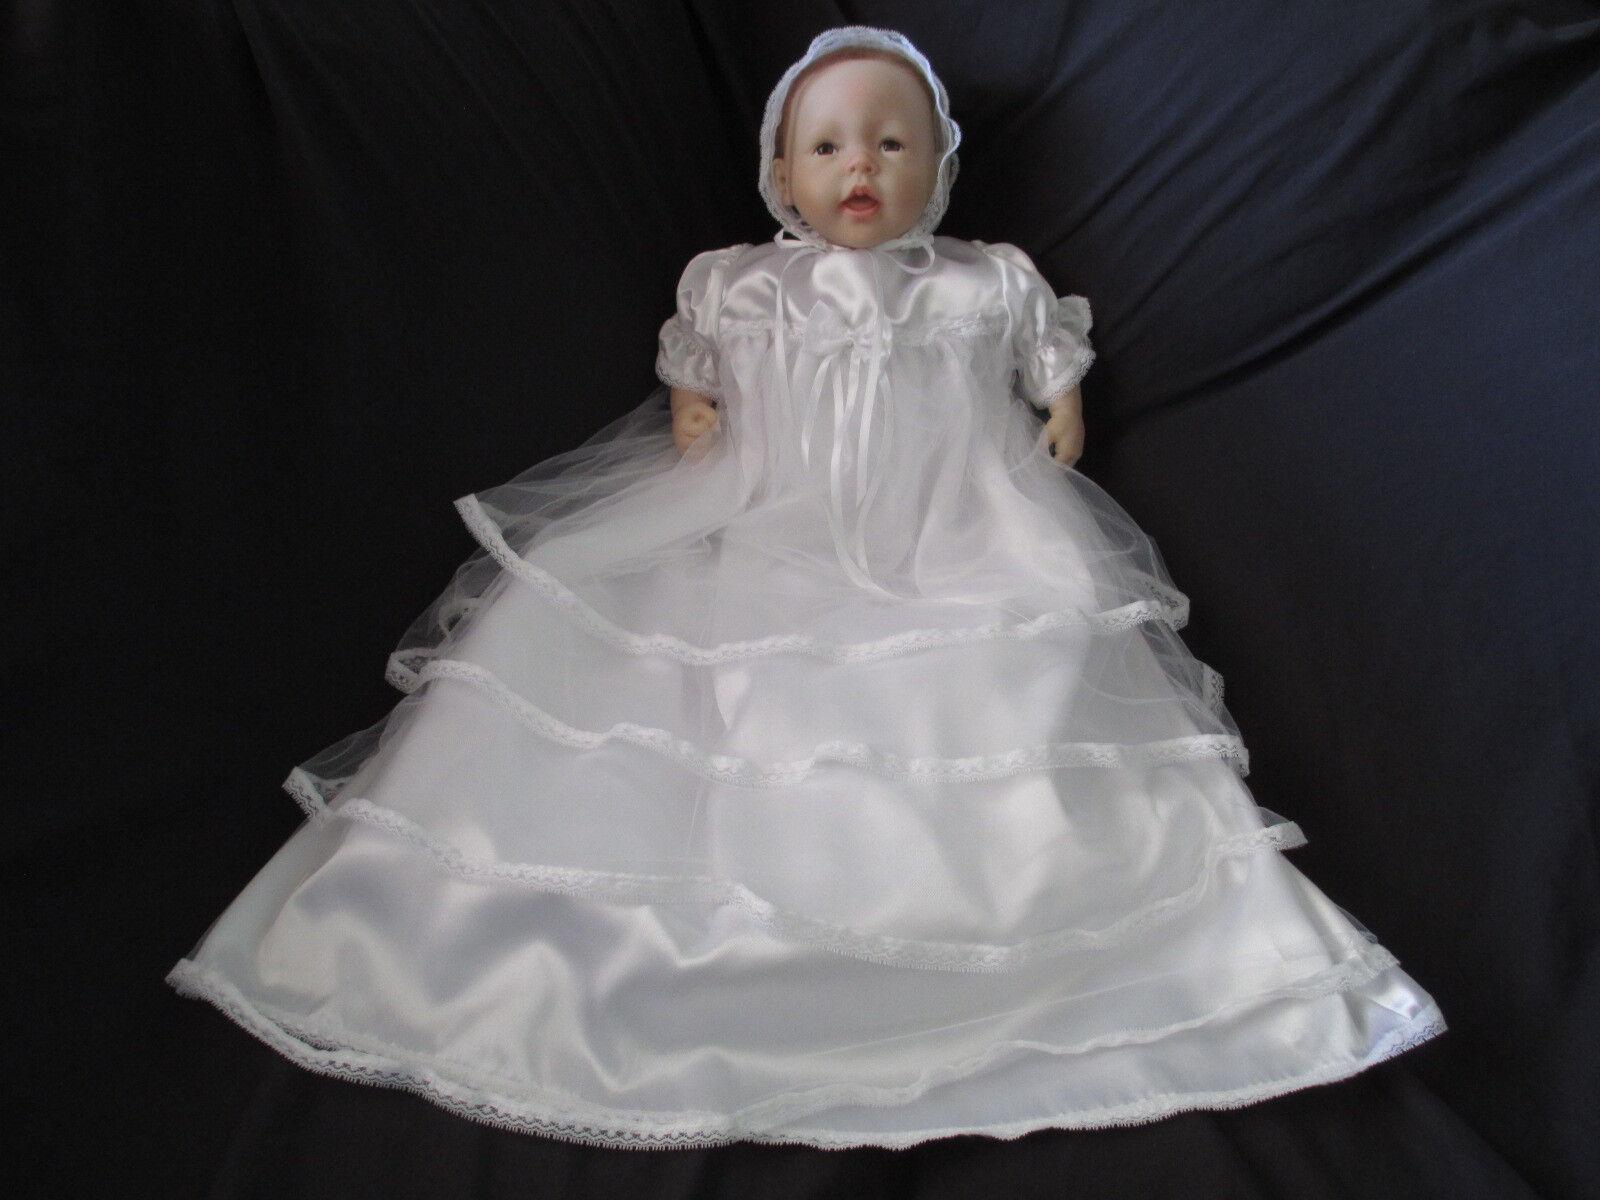 Baby girl satin tulle christening gown baptism dress 0 3 3 6 6 12 m